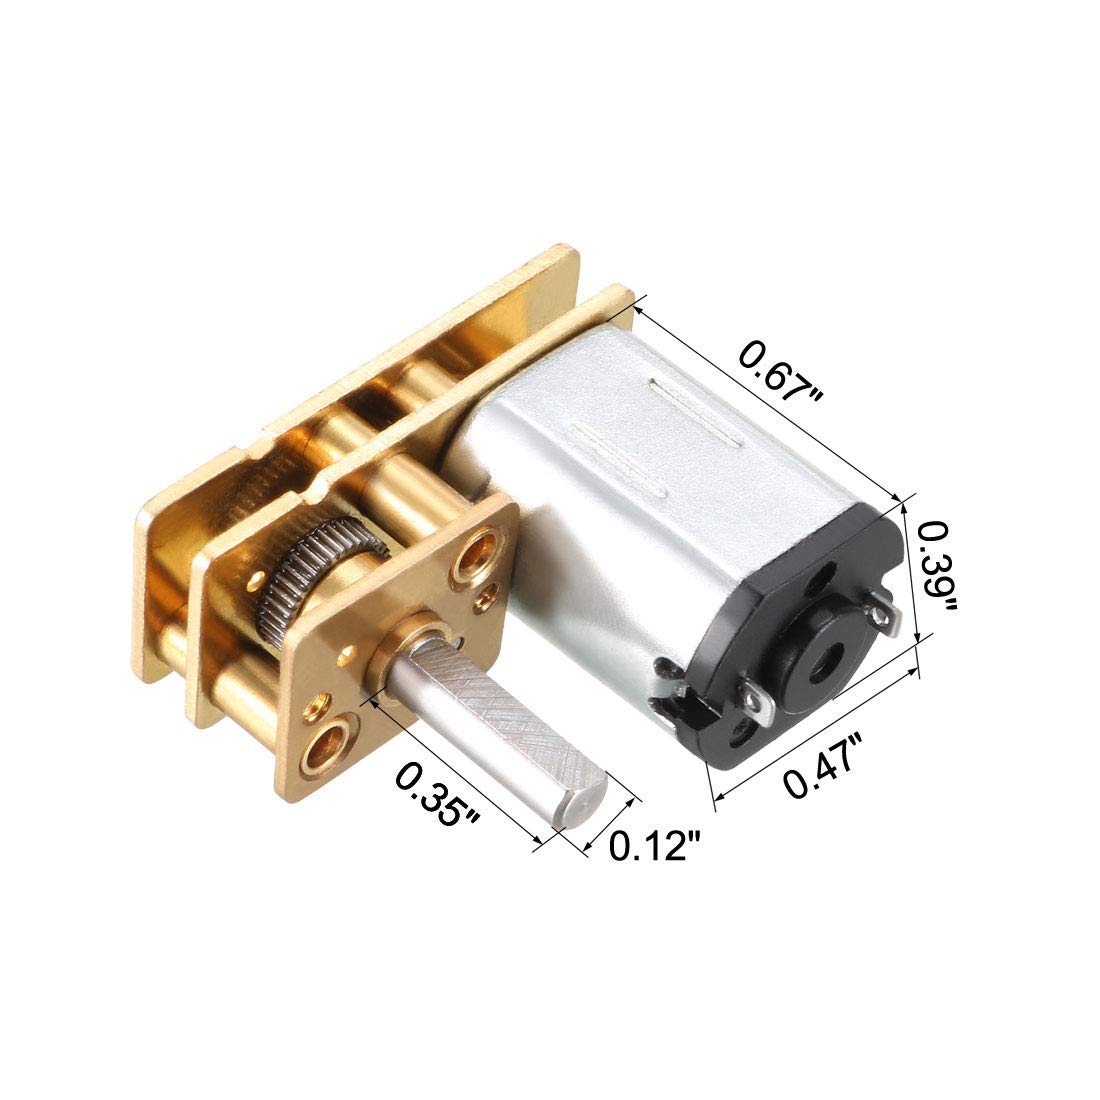 uxcell GA12-N20 6V 60RPM DC Gear Motor with Encoder Speed Velocity Measurement for Mini Car Balance Motor Encoder DIY